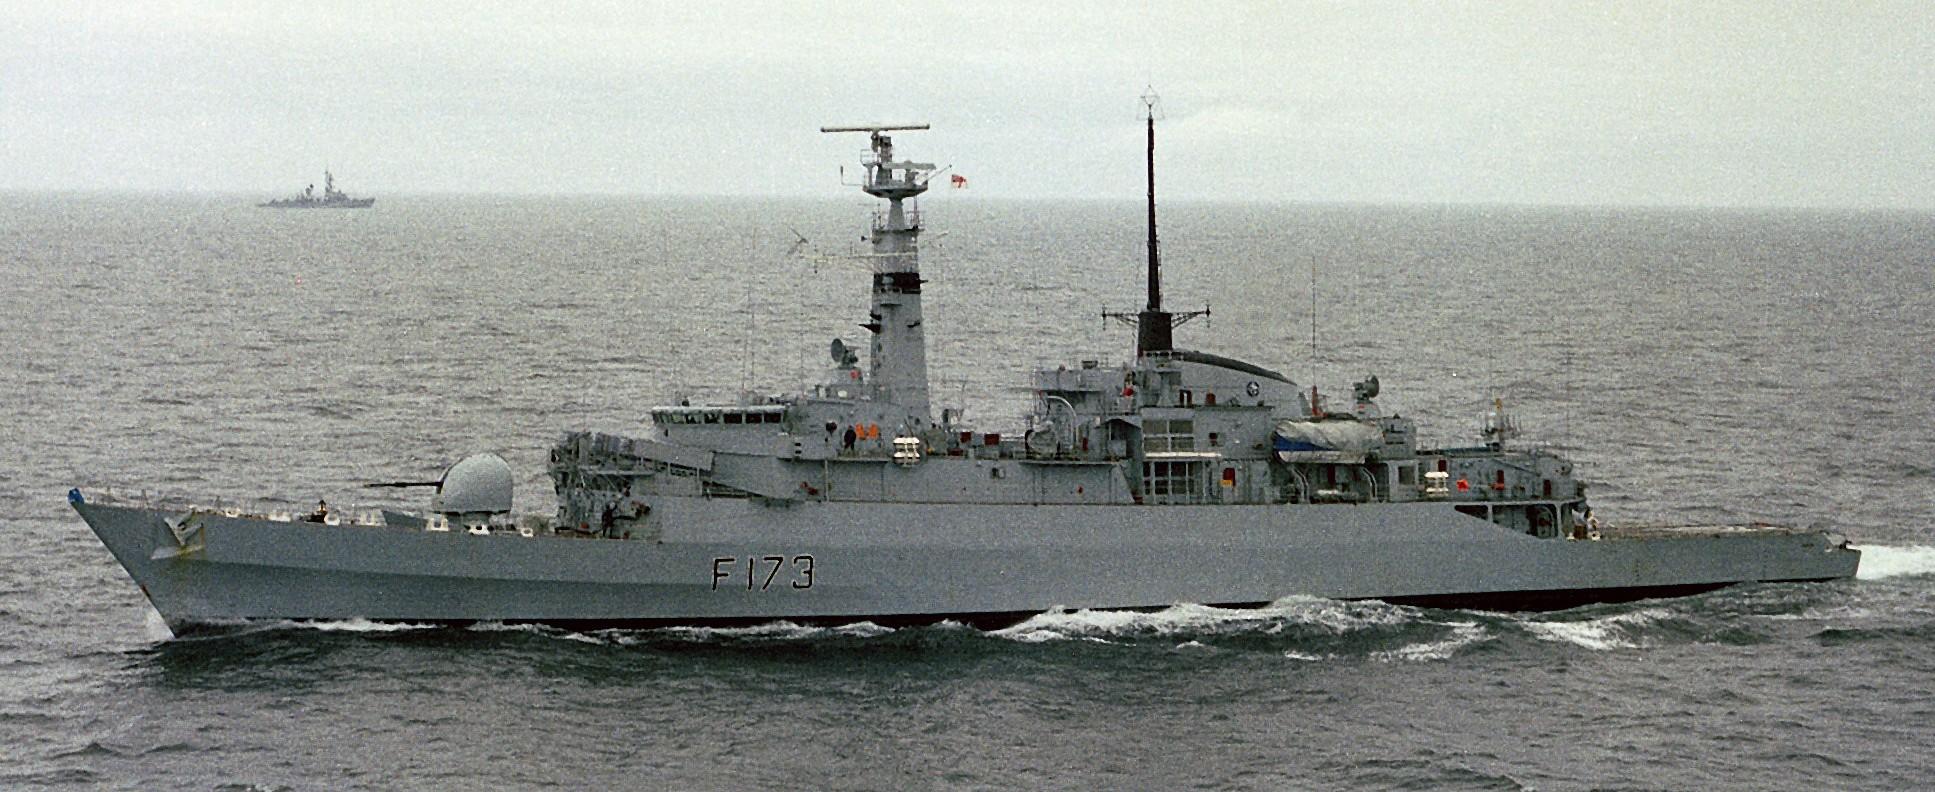 amazon class type 21 frigate royal navy